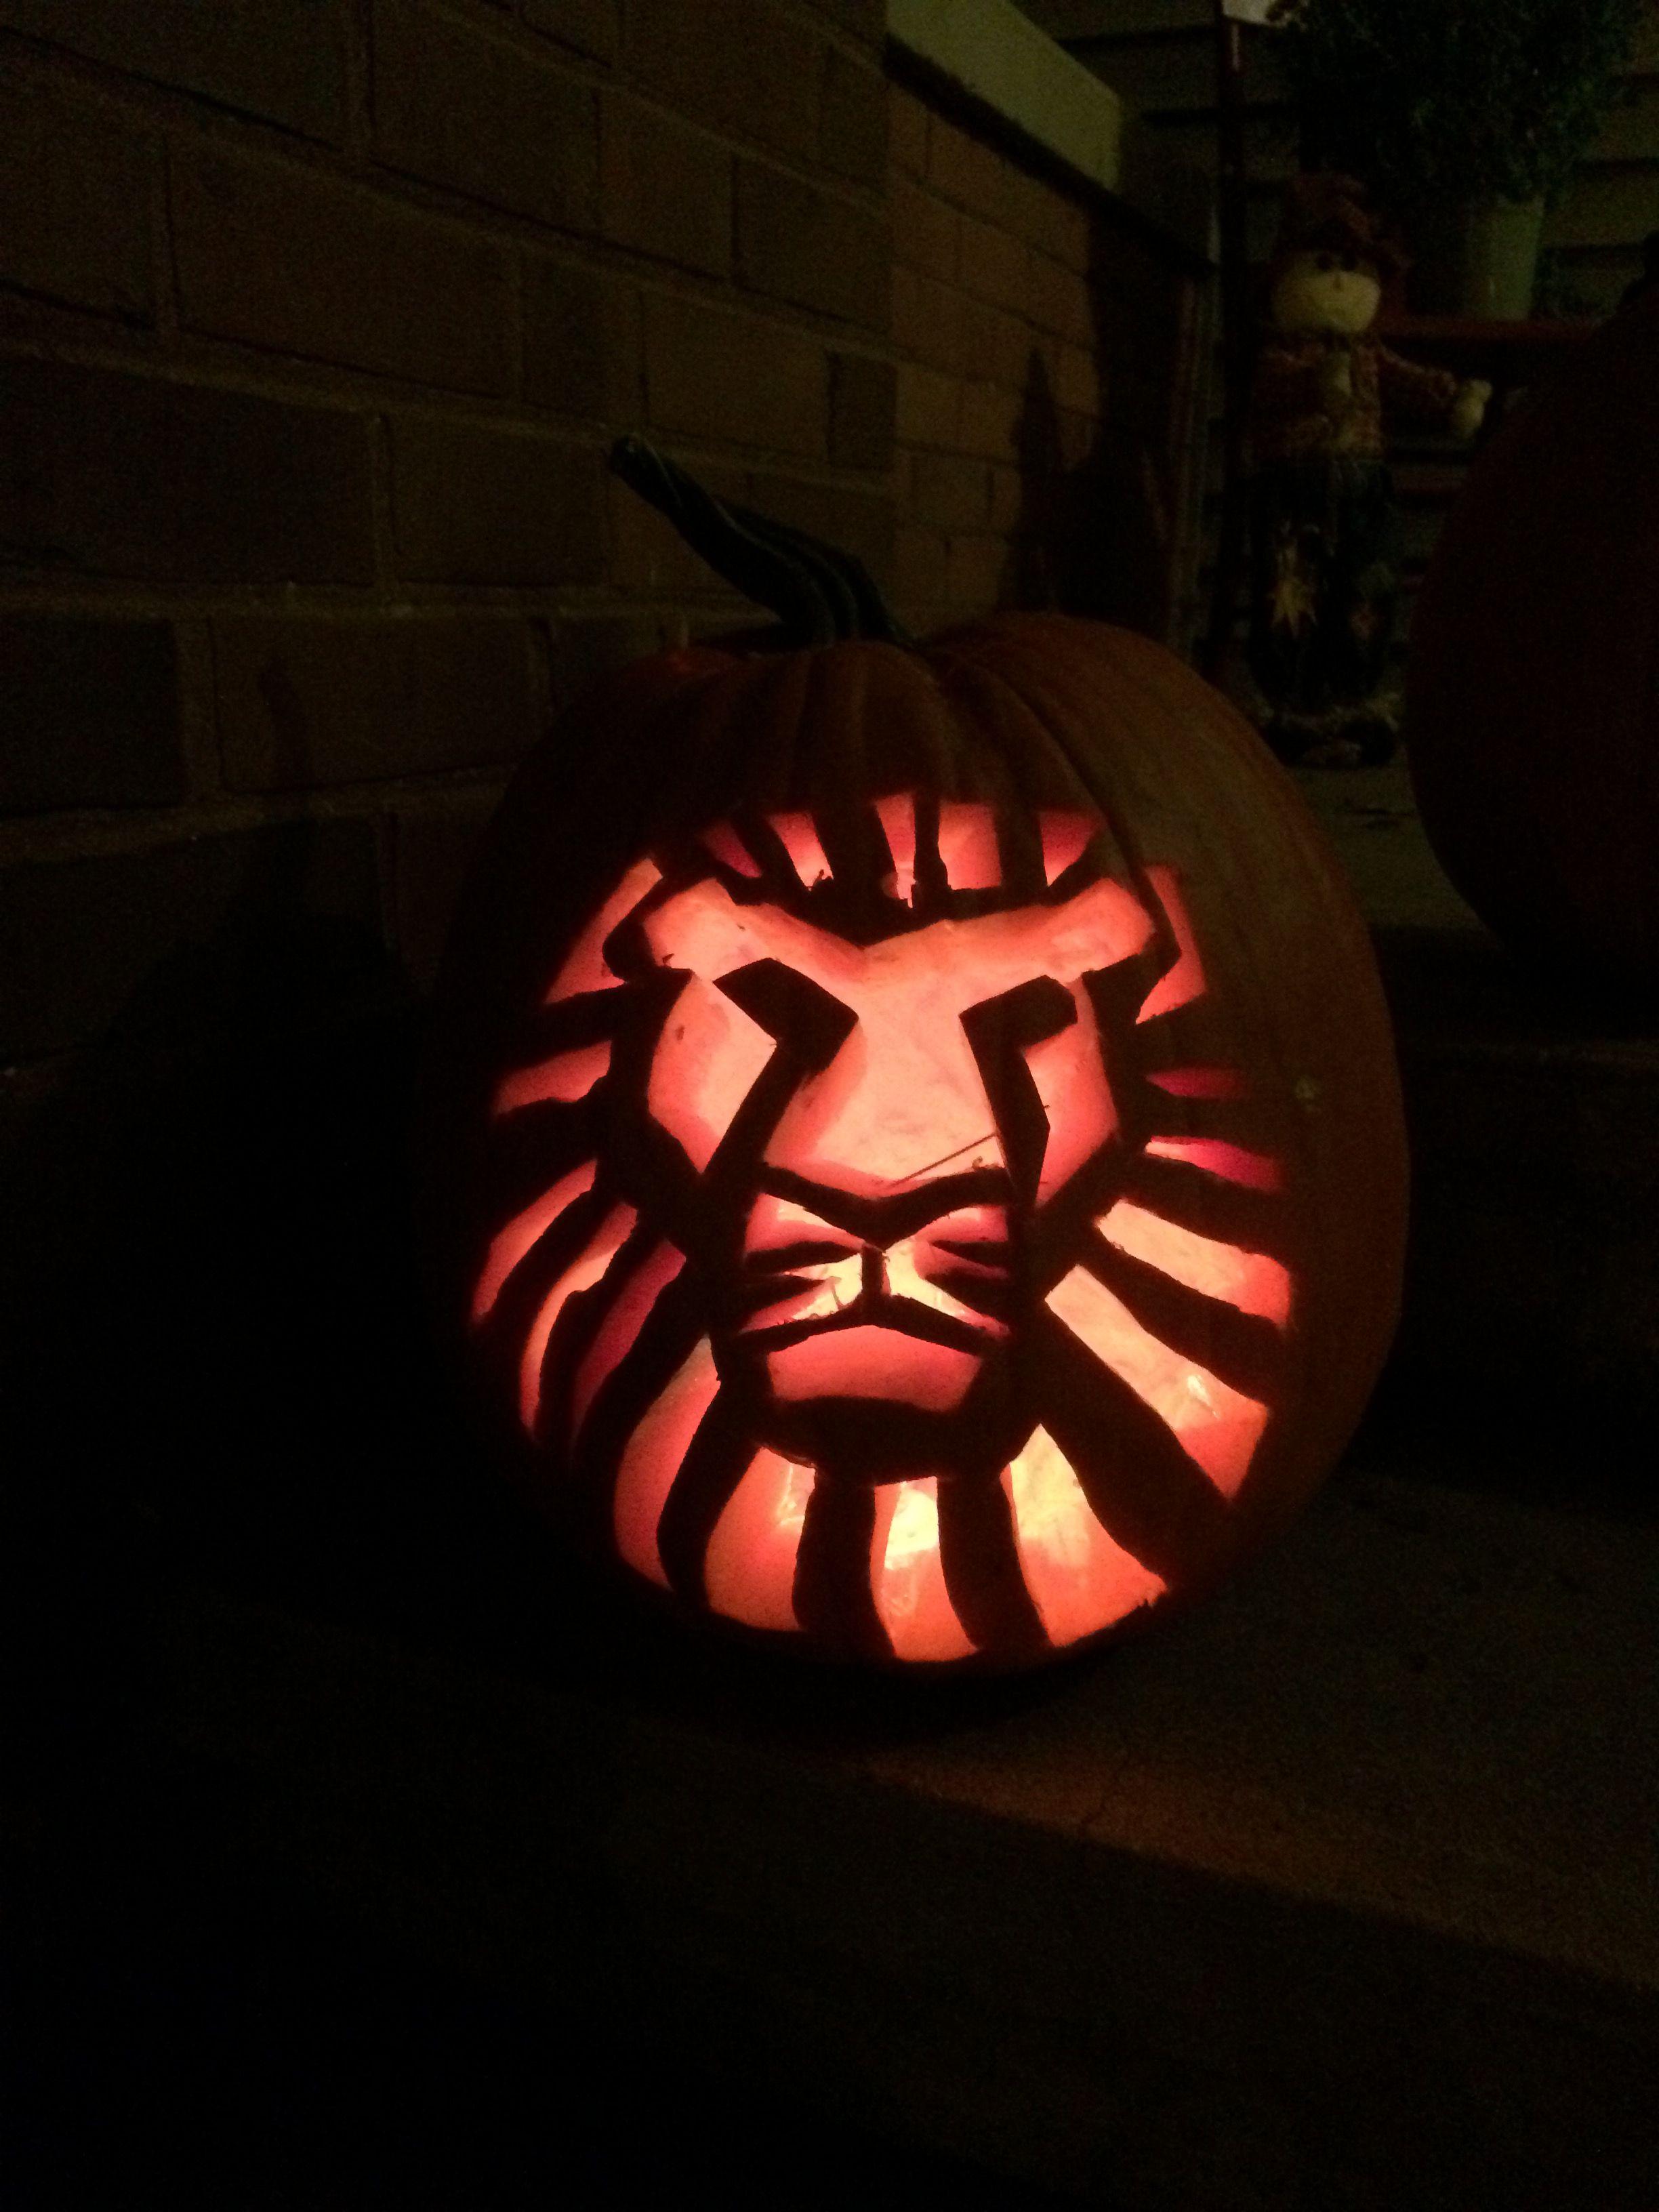 pumpkin template lion king  Lion King pumpkin carving in 5 | Cute pumpkin carving ...